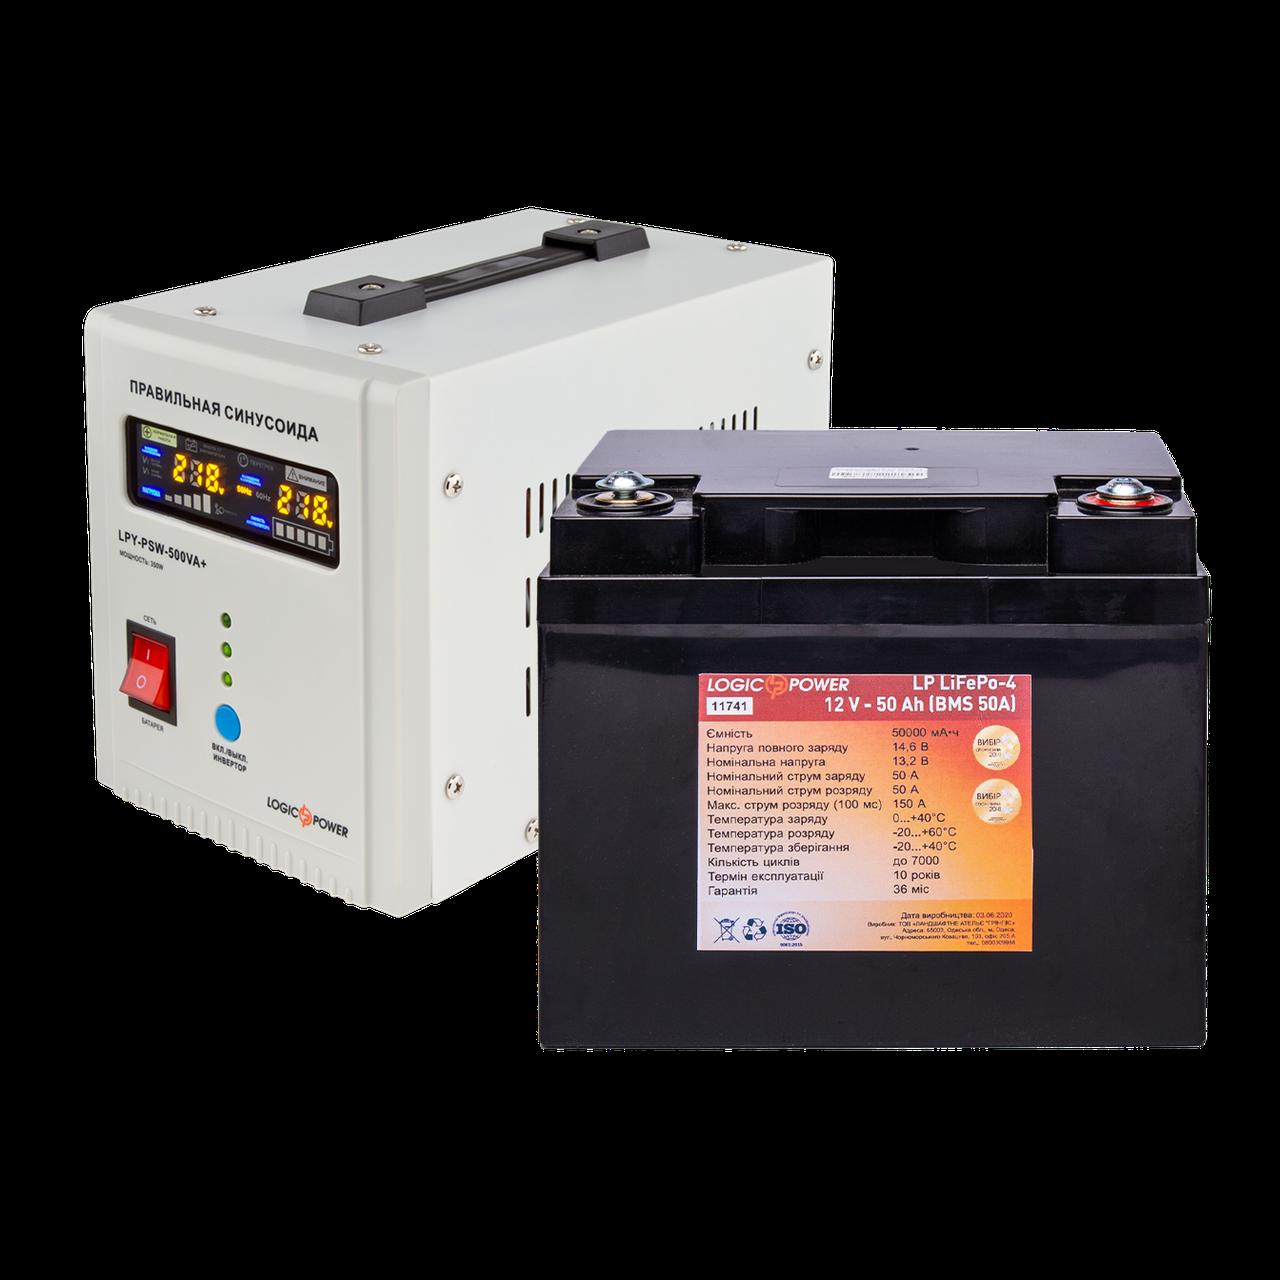 Комплект резервного питания для котла Logicpower 500 + литиевая (Lifepo4) батарея 750ватт